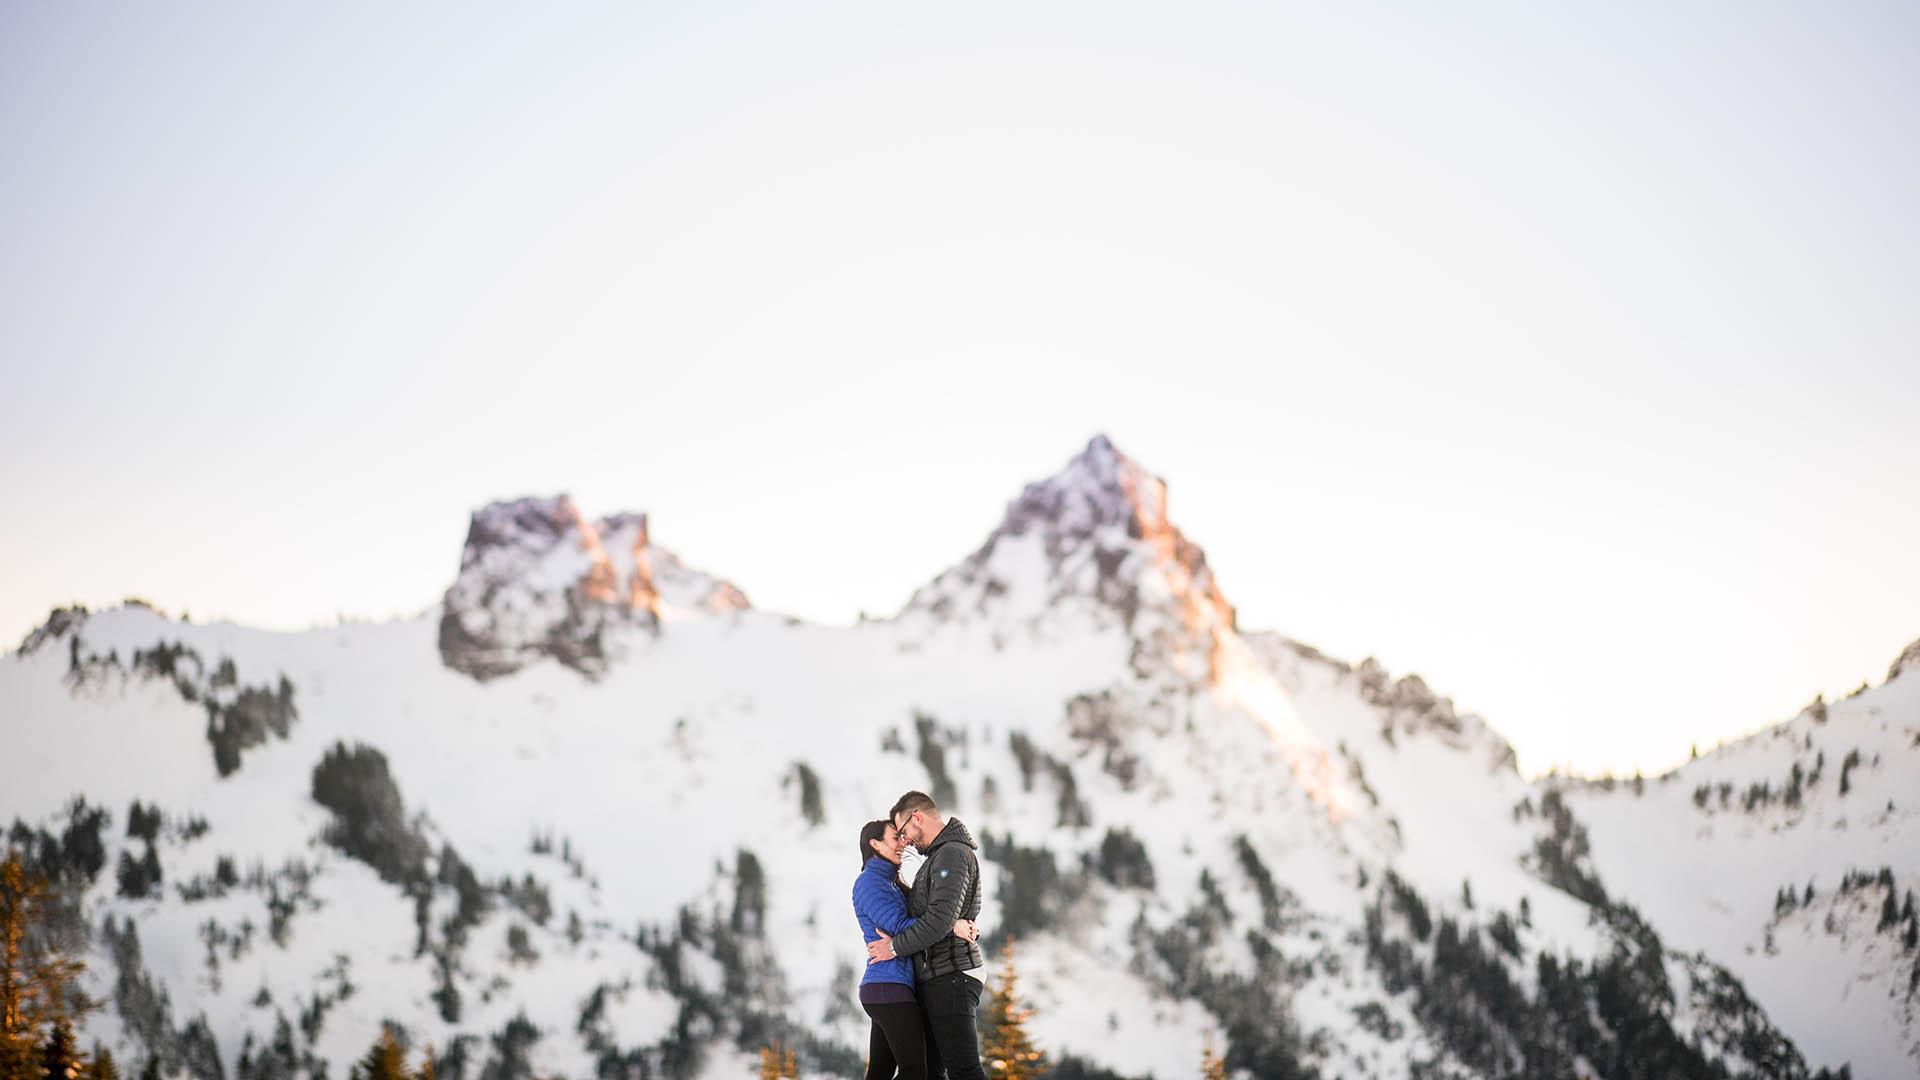 mount rainier winter engagement photos featured